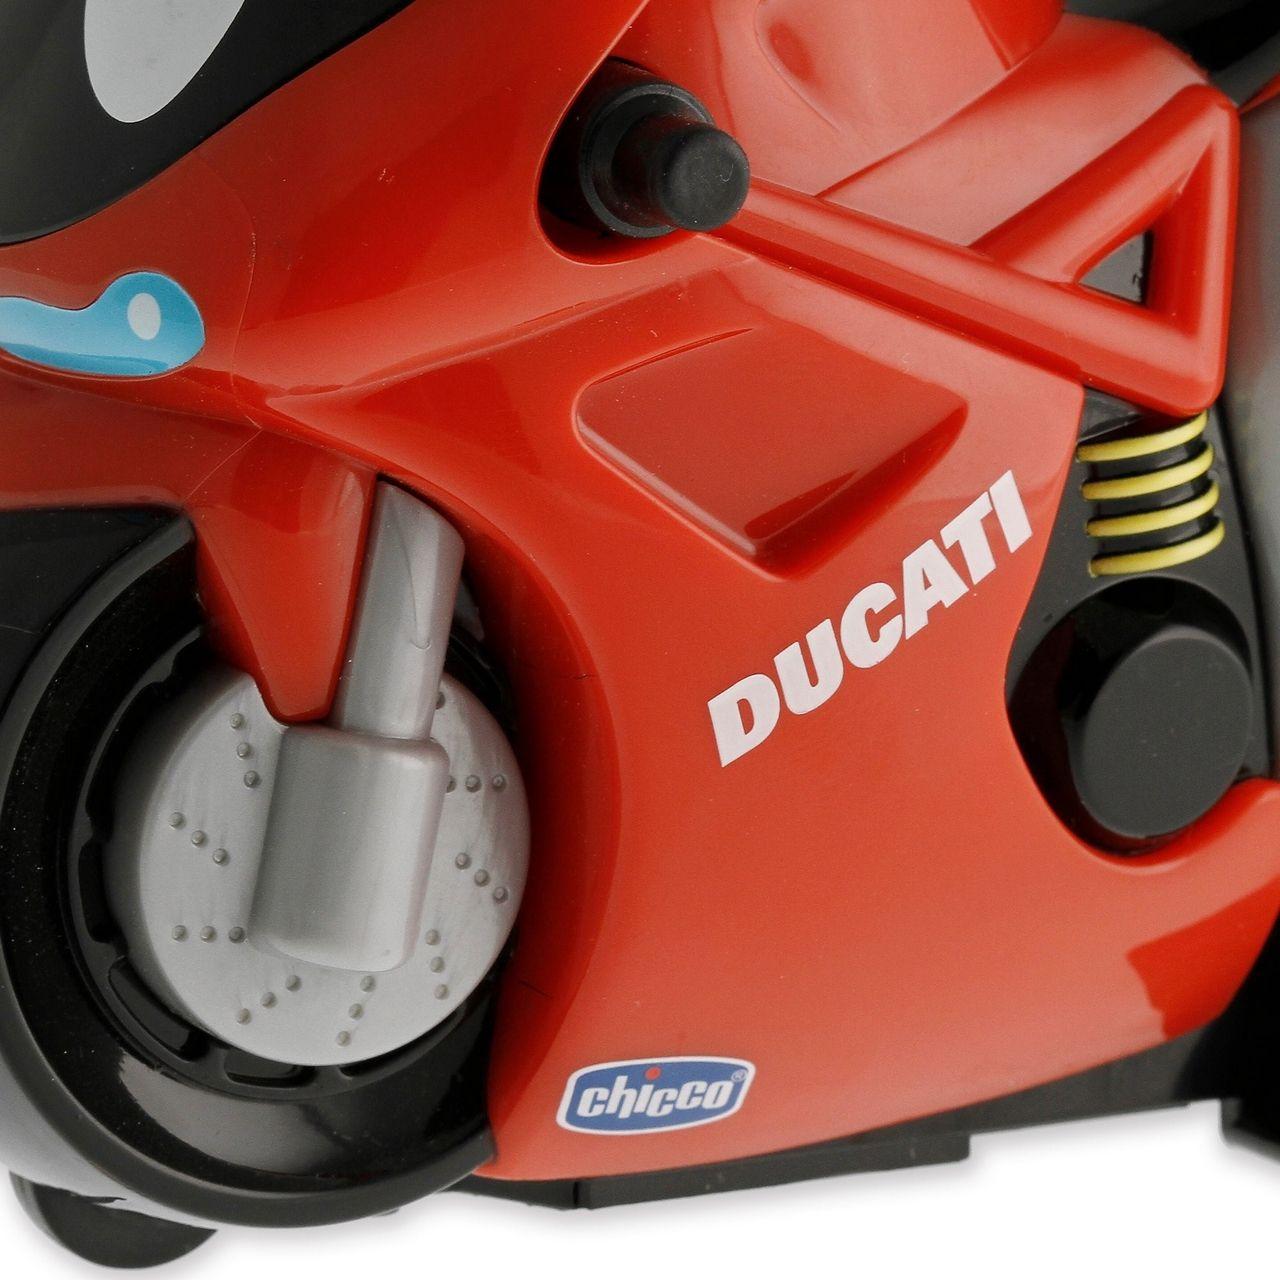 【DUCATI performance】Ducati Turbo Touch 玩具摩托車 - 「Webike-摩托百貨」